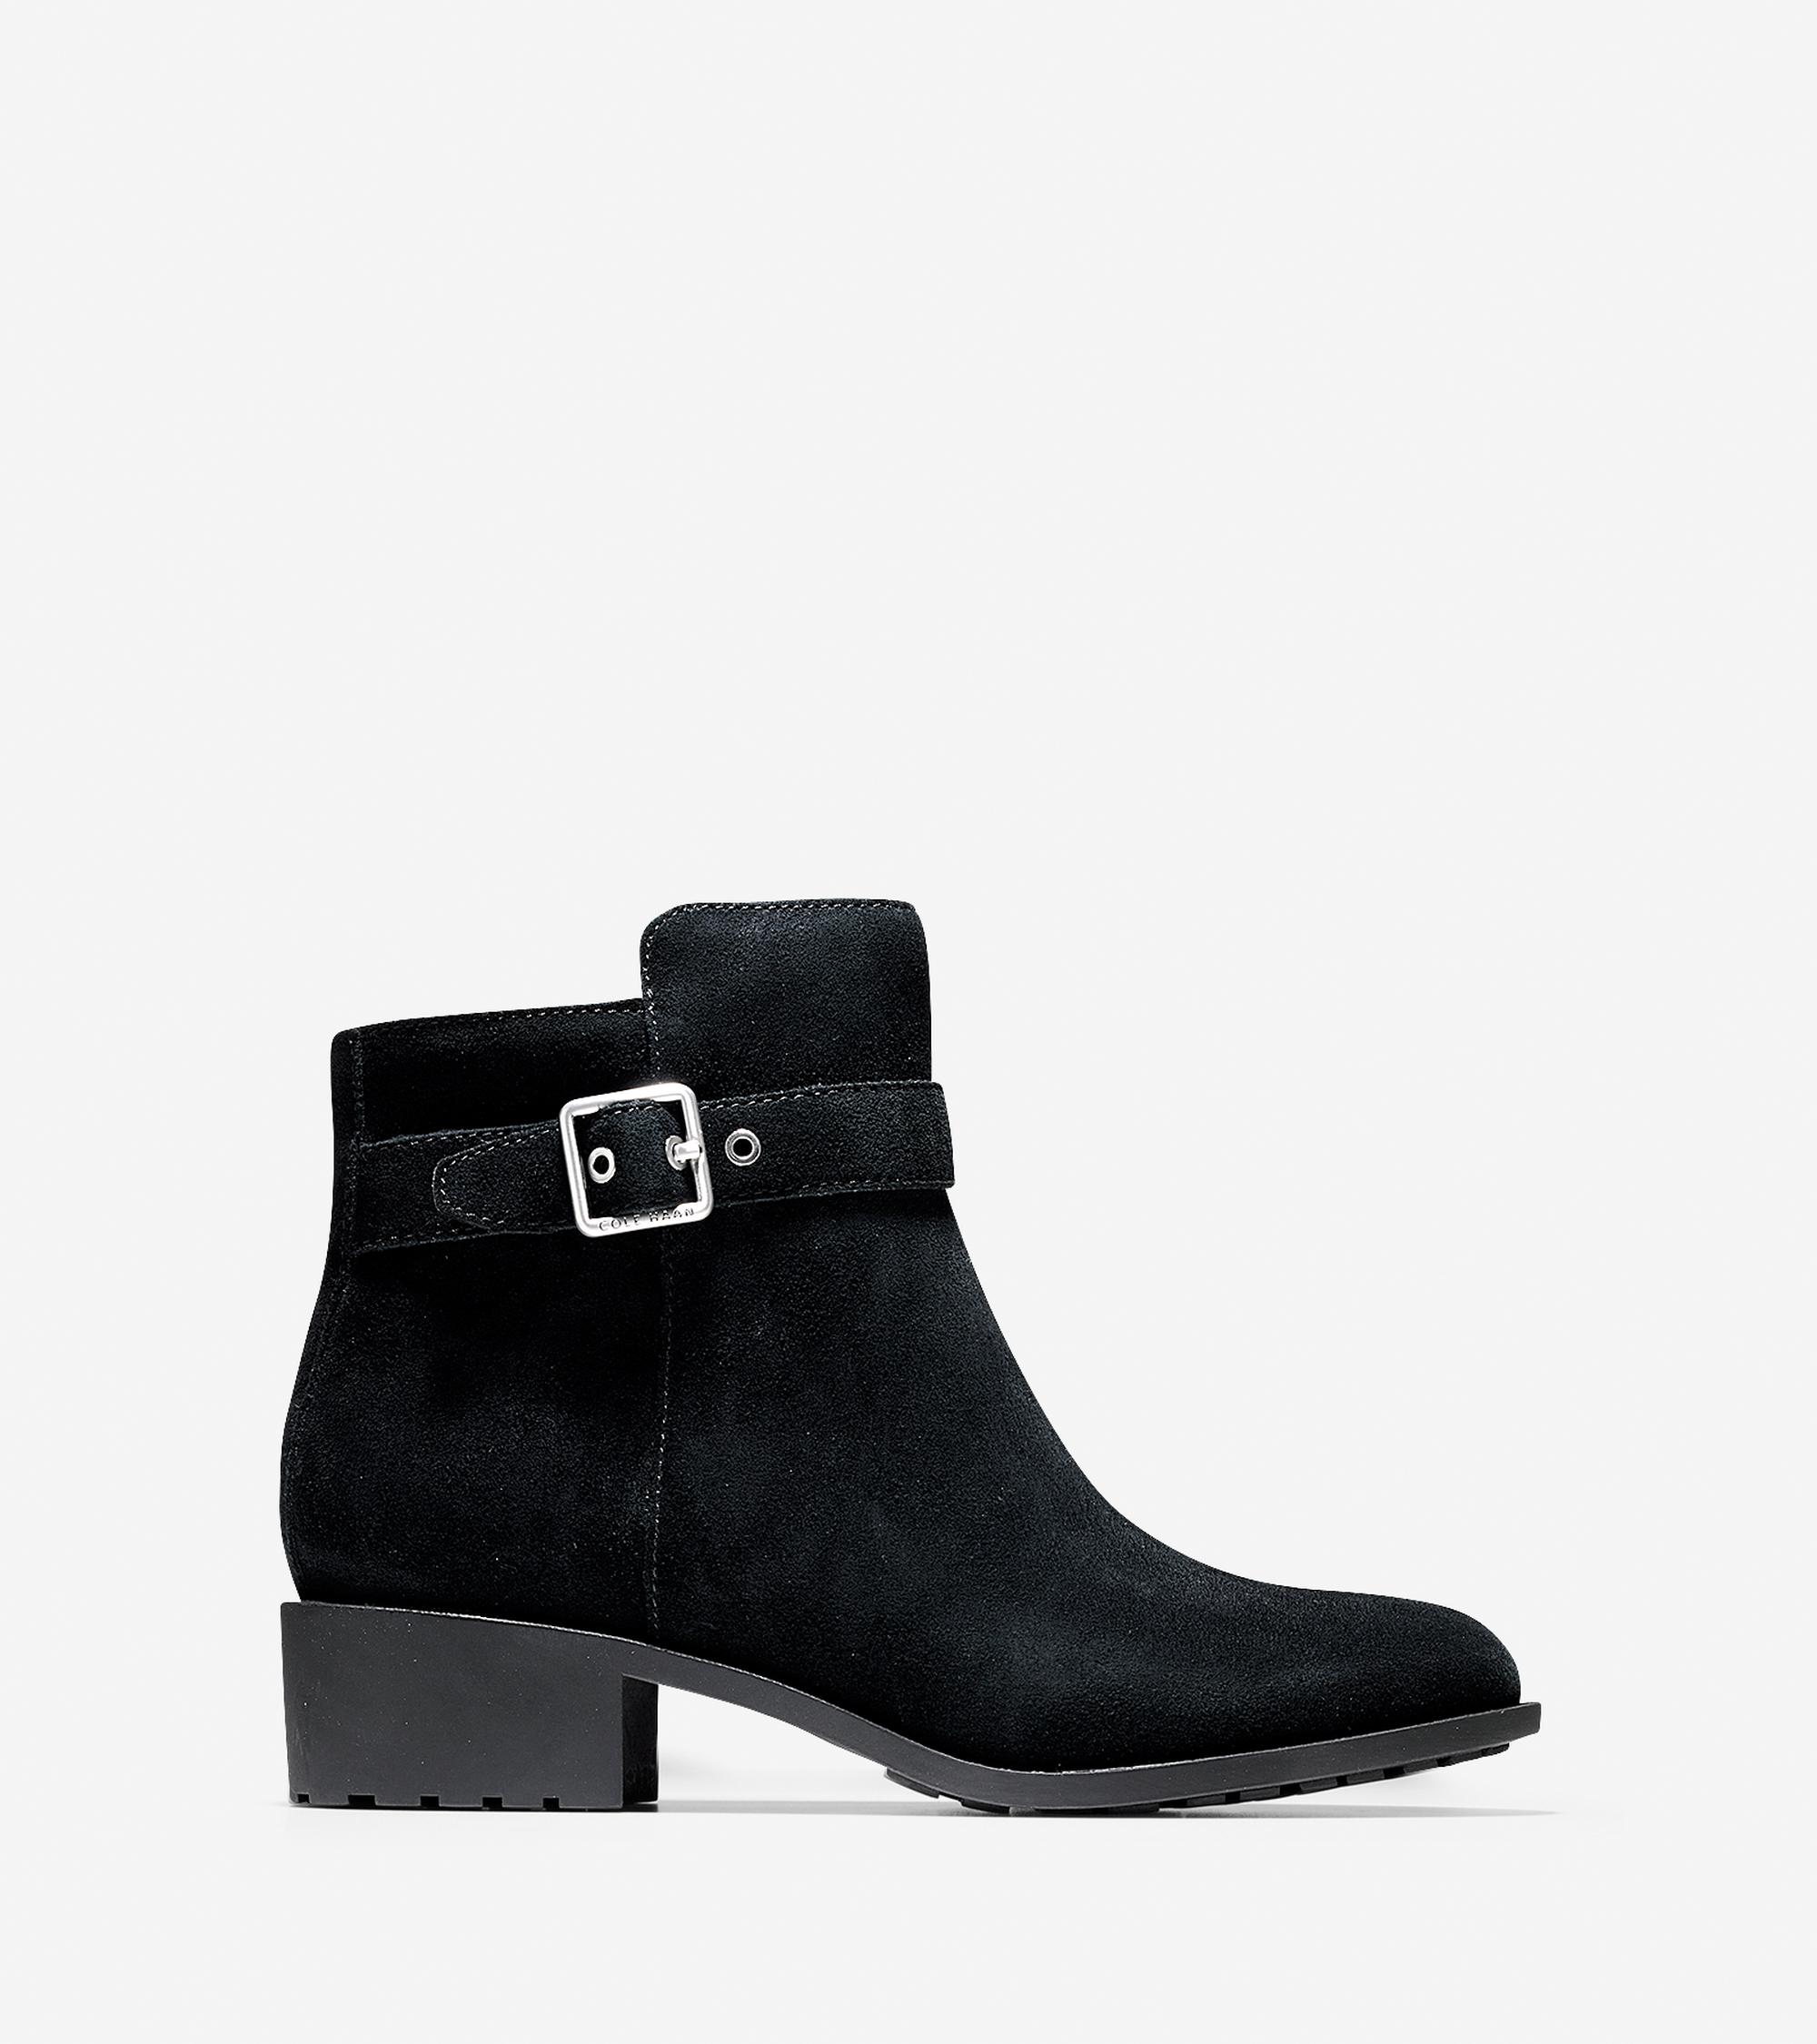 cole haan indiana waterproof boot in black lyst